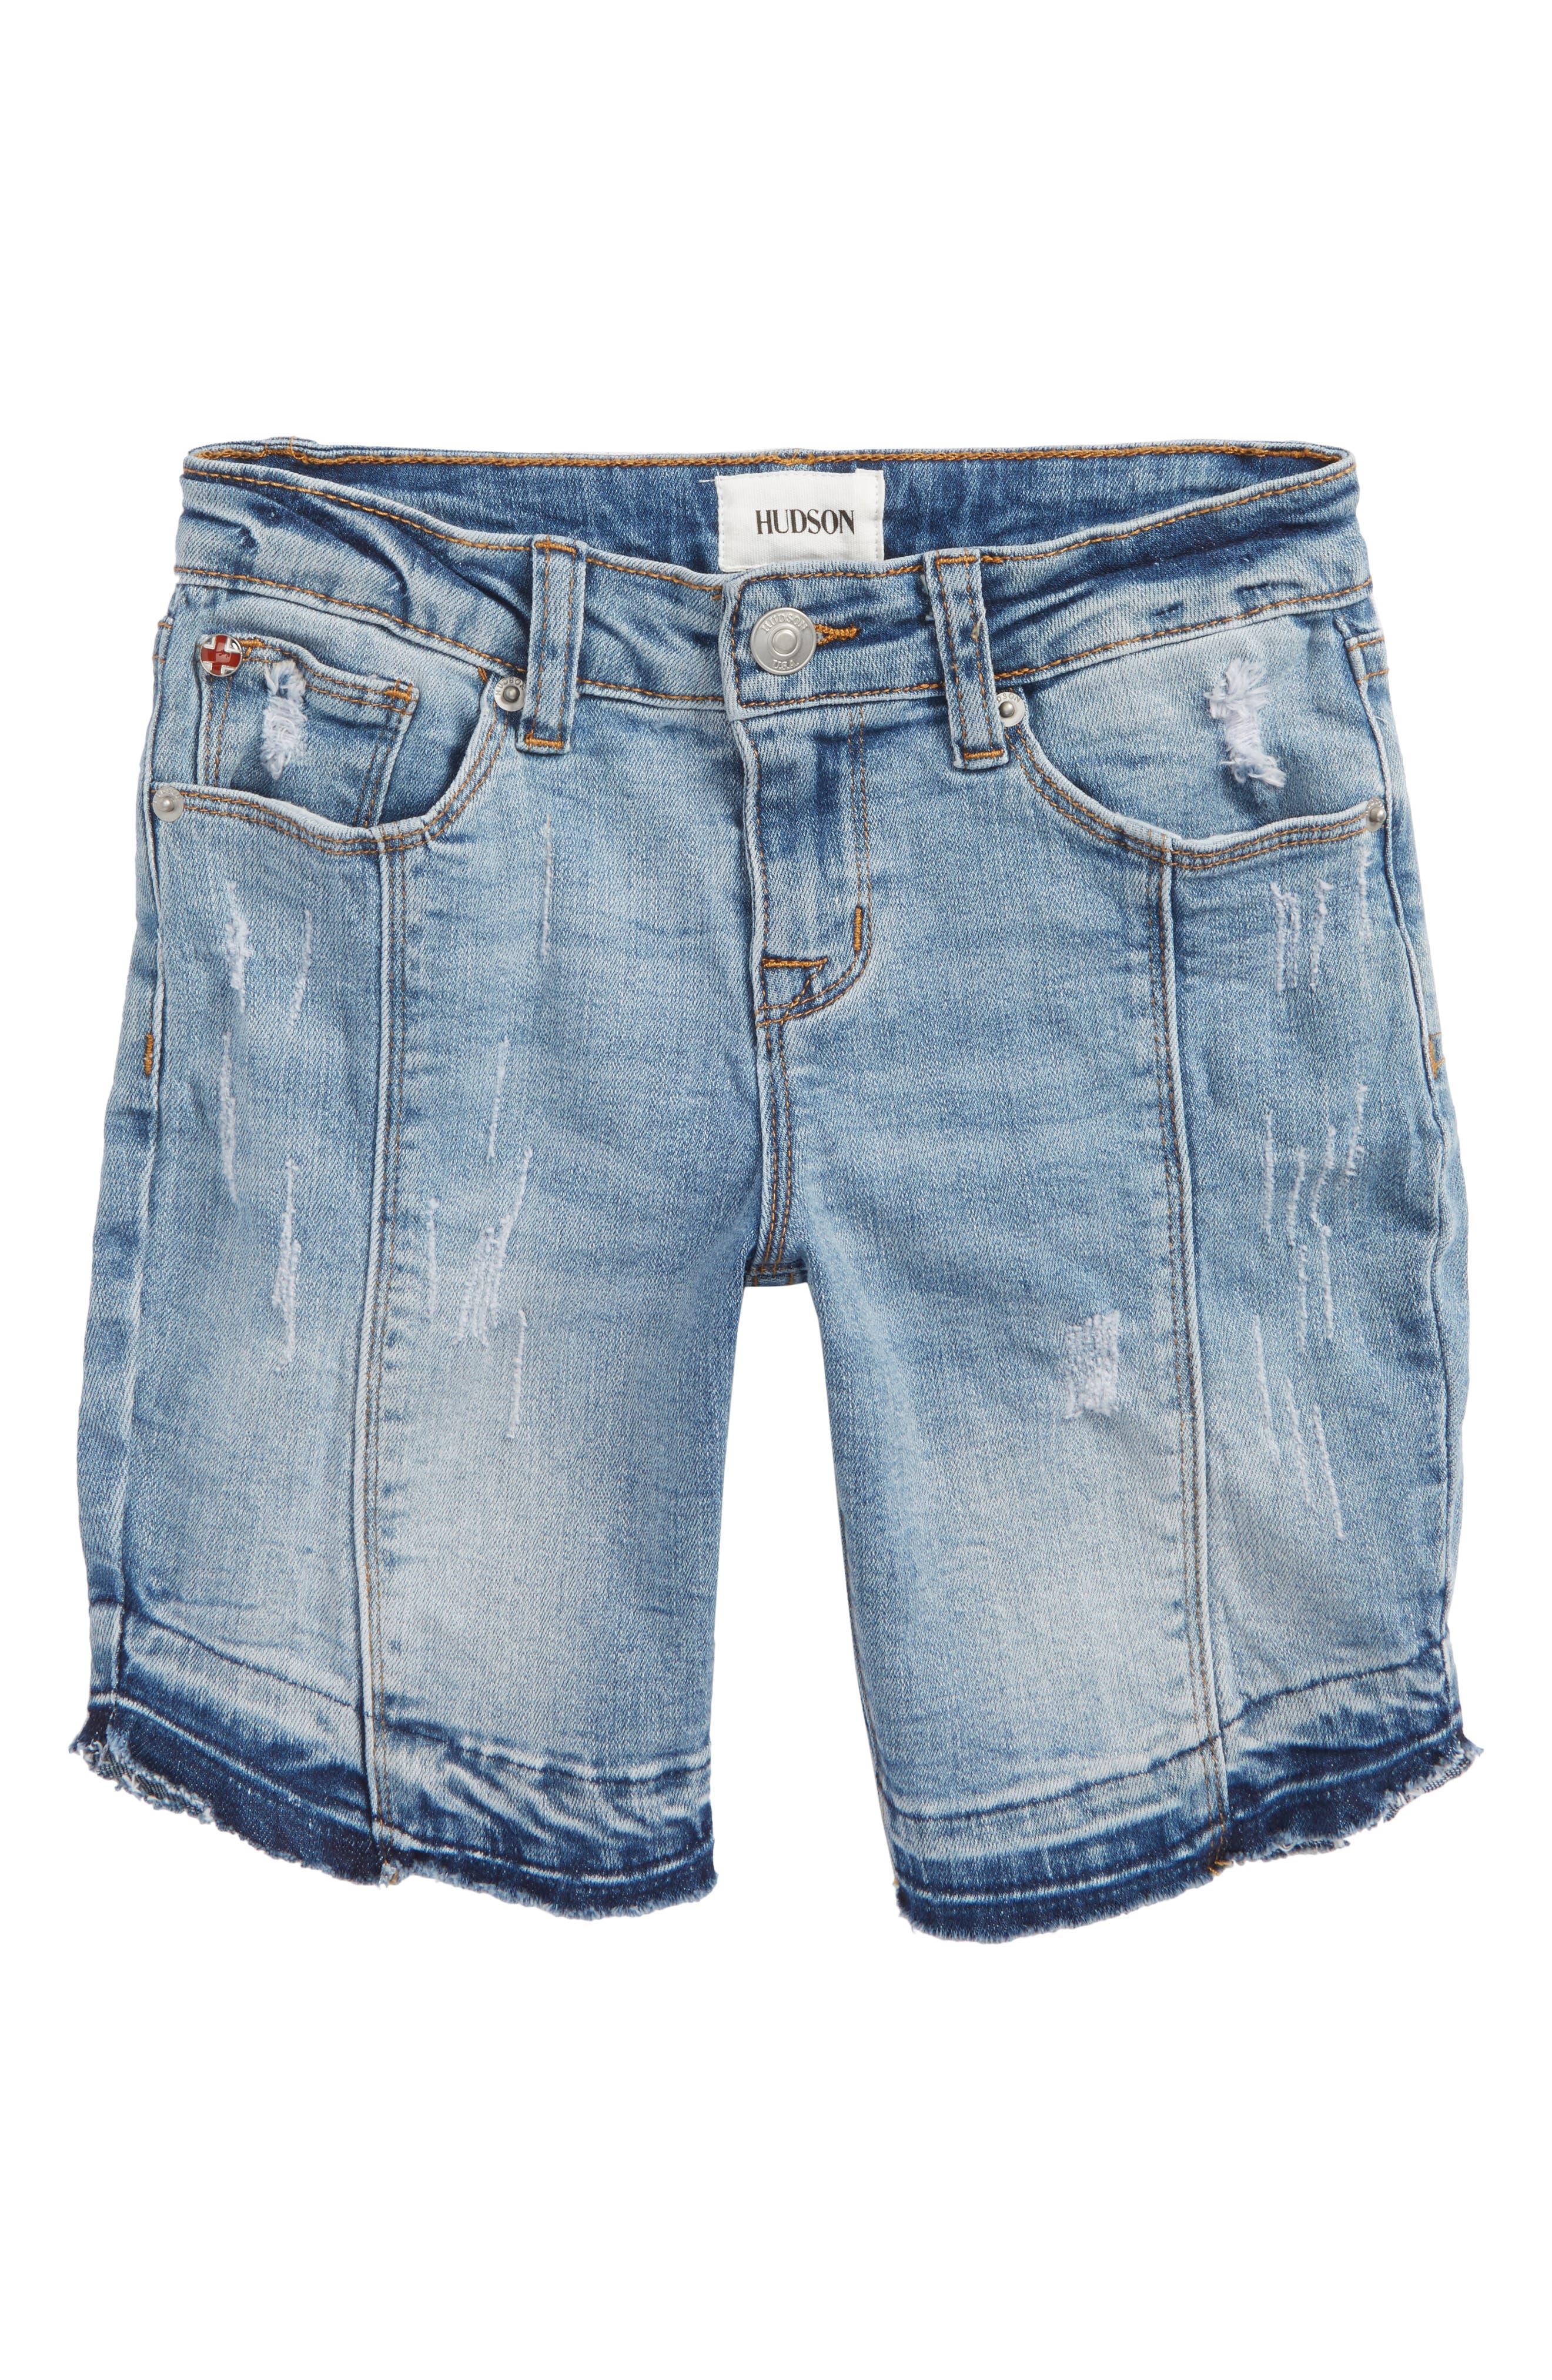 Release Hem Distressed Denim Shorts,                             Main thumbnail 1, color,                             Cali Blue